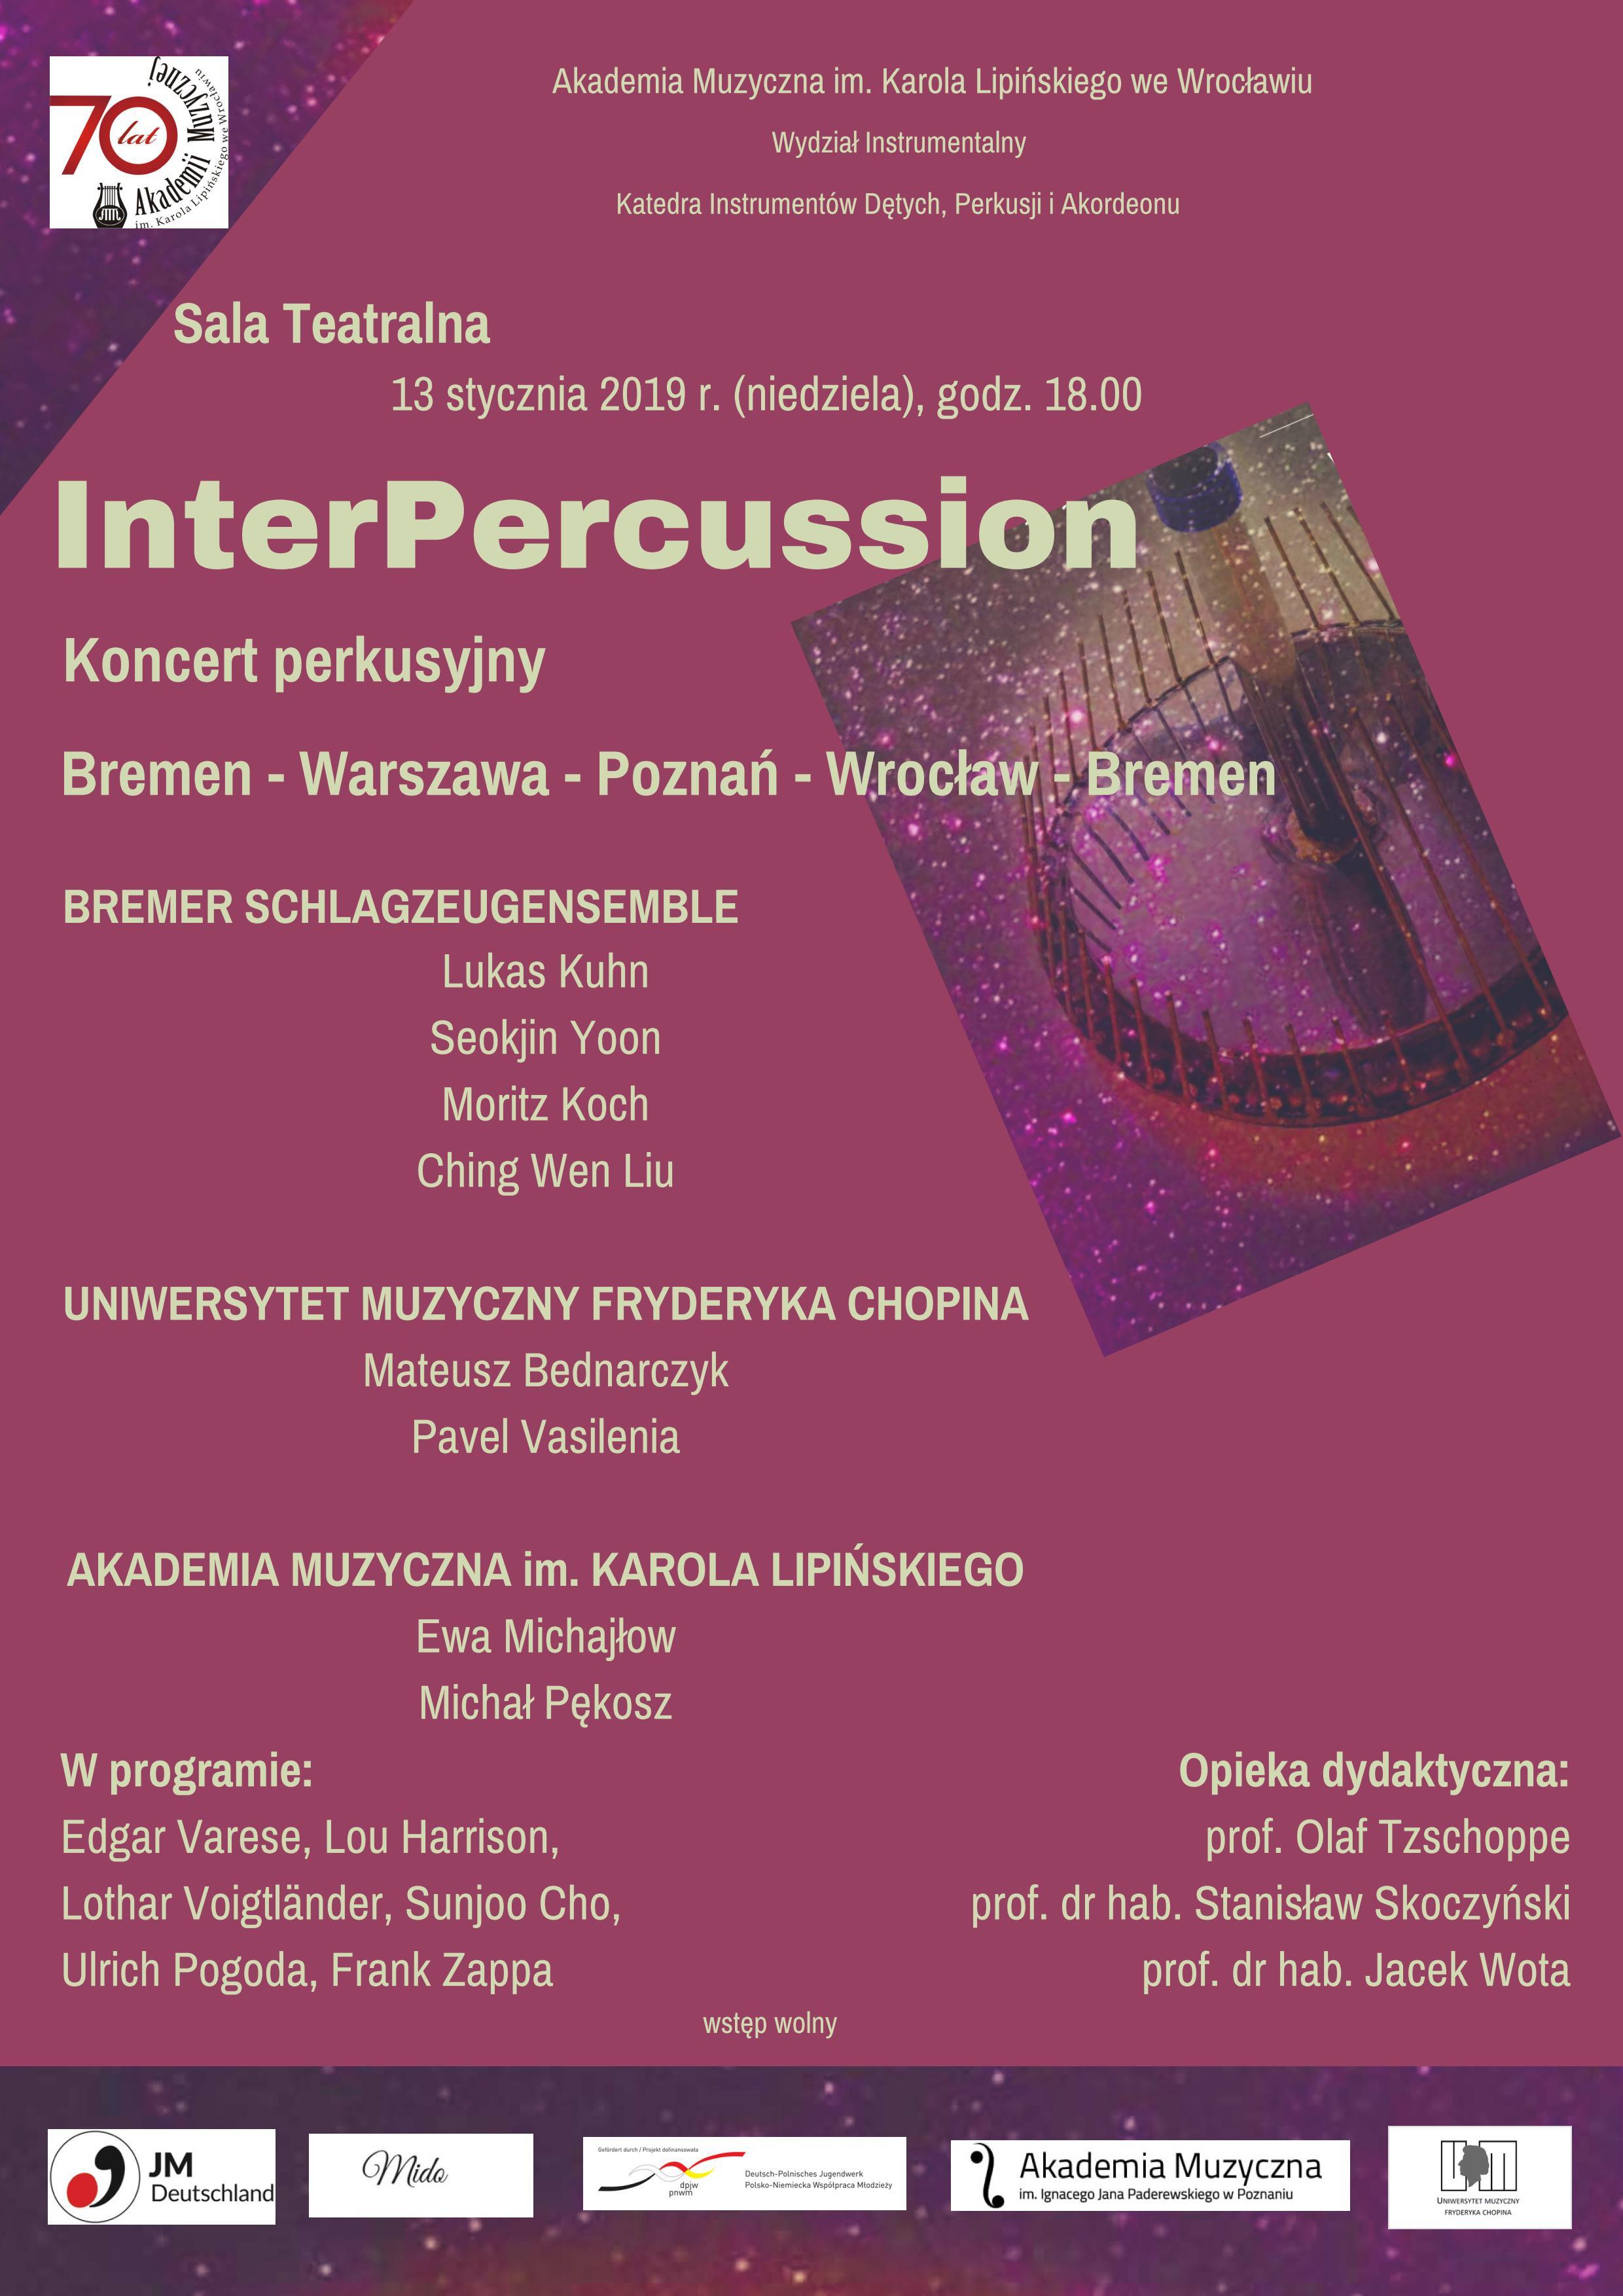 Koncert perkusyjny